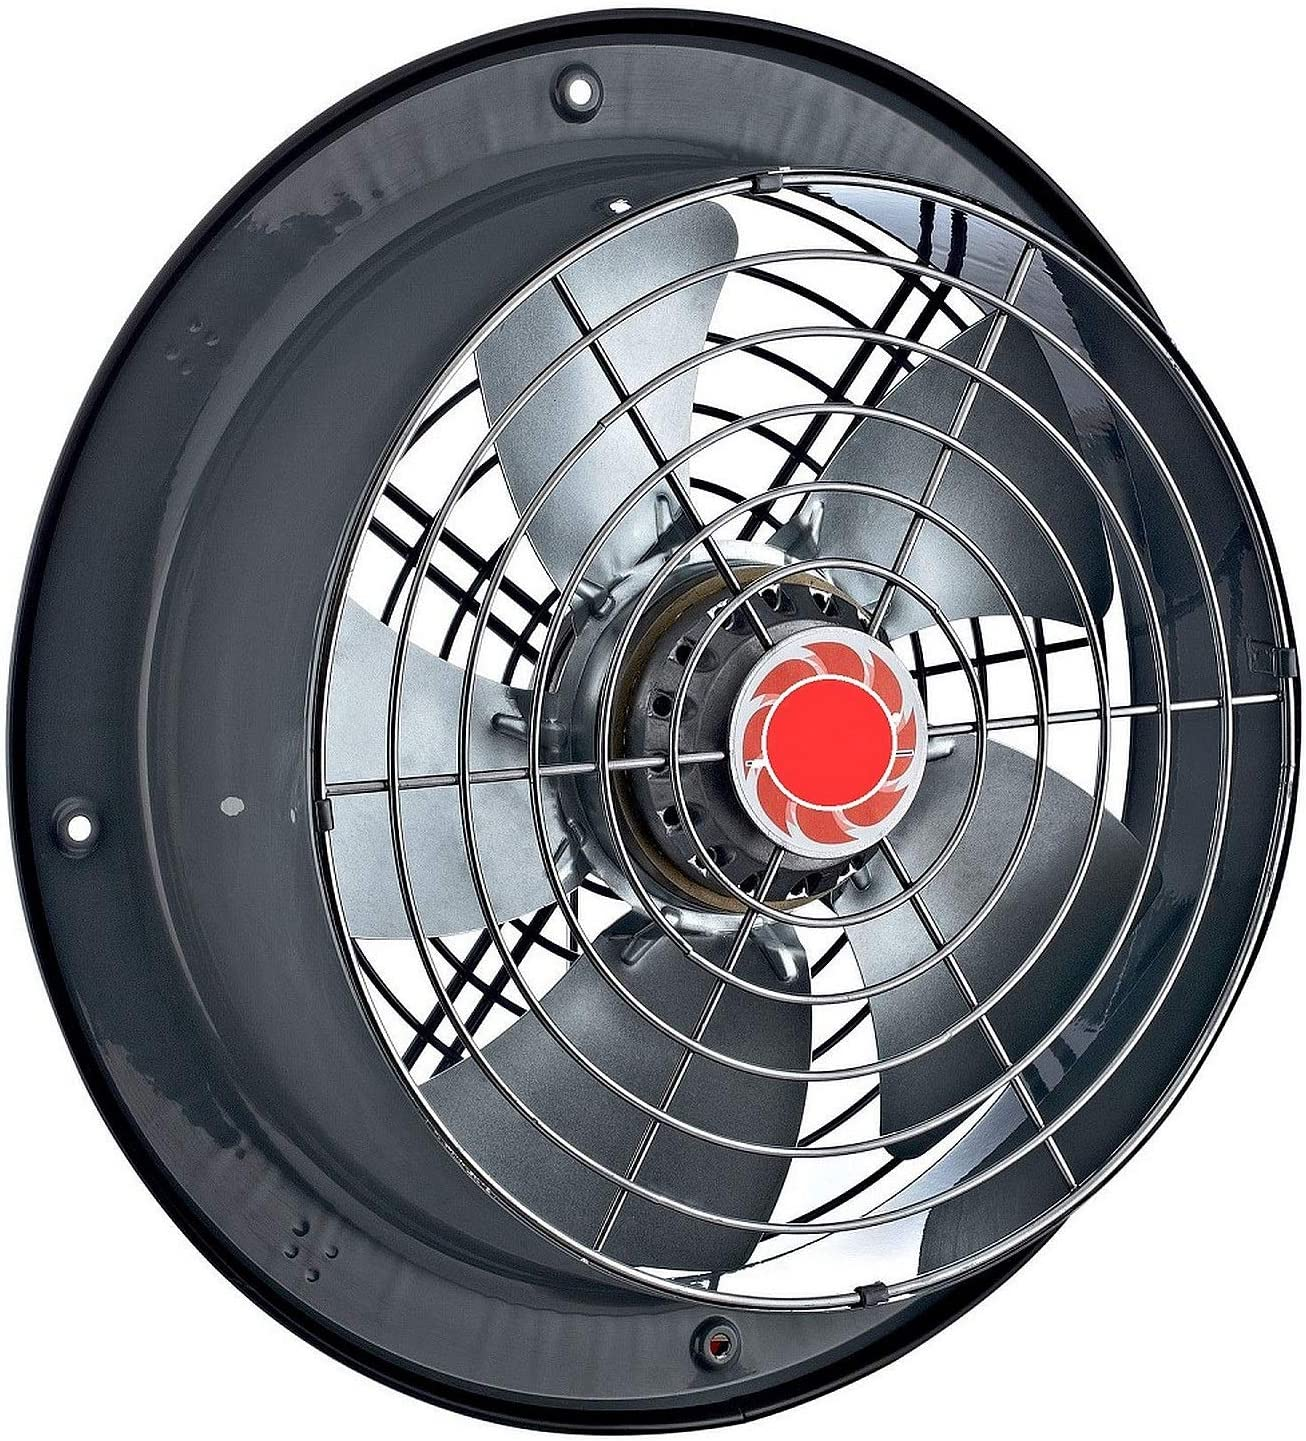 BDRAX 300 Industrial Axial Axiales Ventilador Ventilación extractor Ventiladores ventilador Fan Fans industriales extractores centrifugos radiales turbina aspiracion